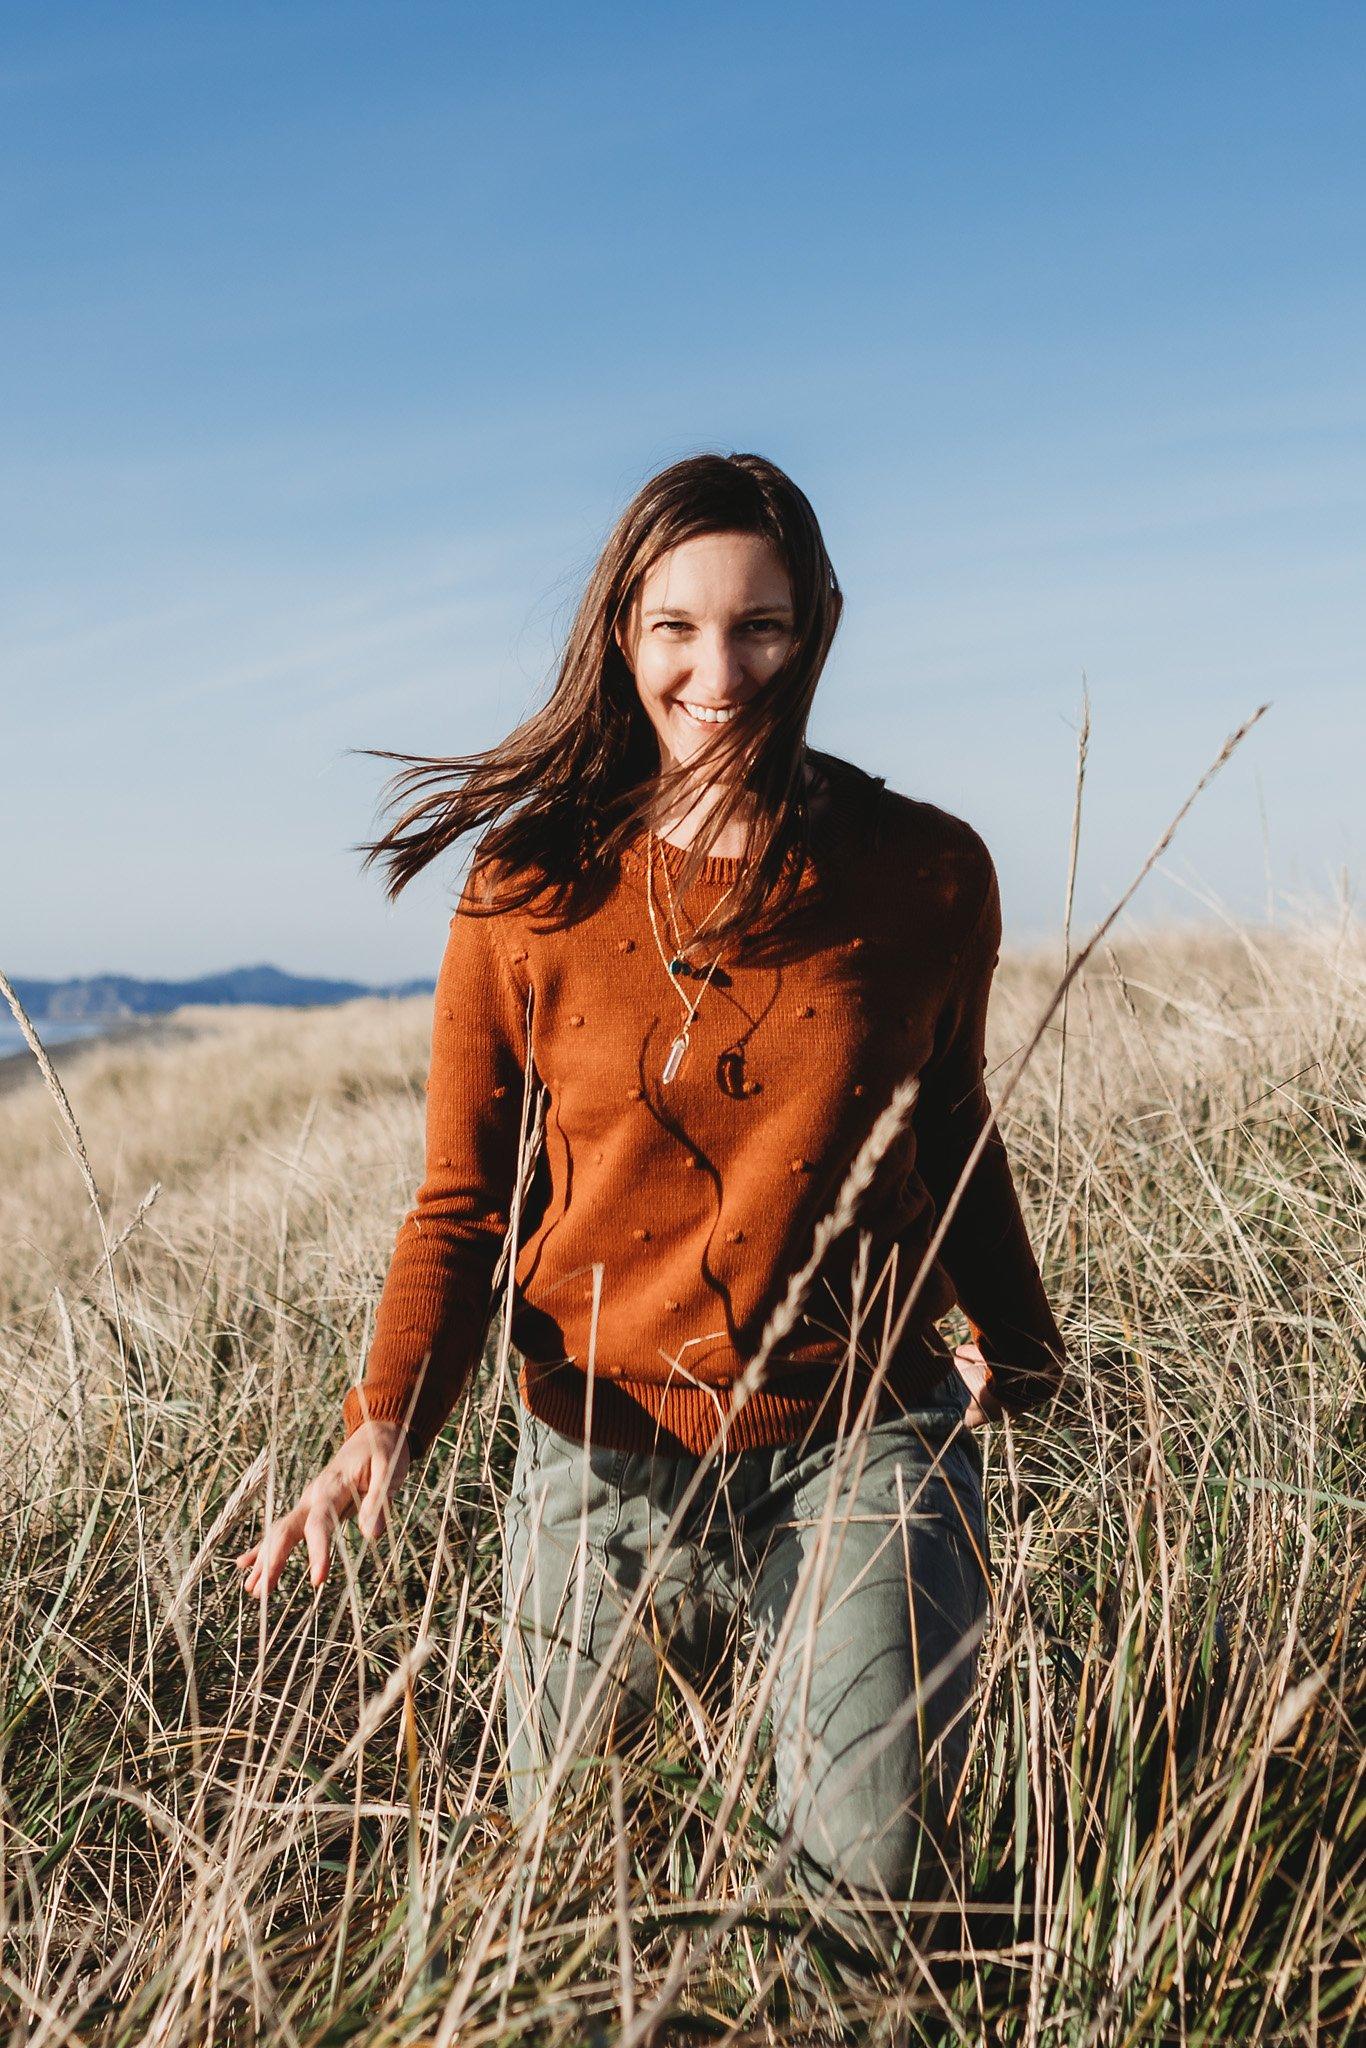 doula and birth photographer Jen Berryman